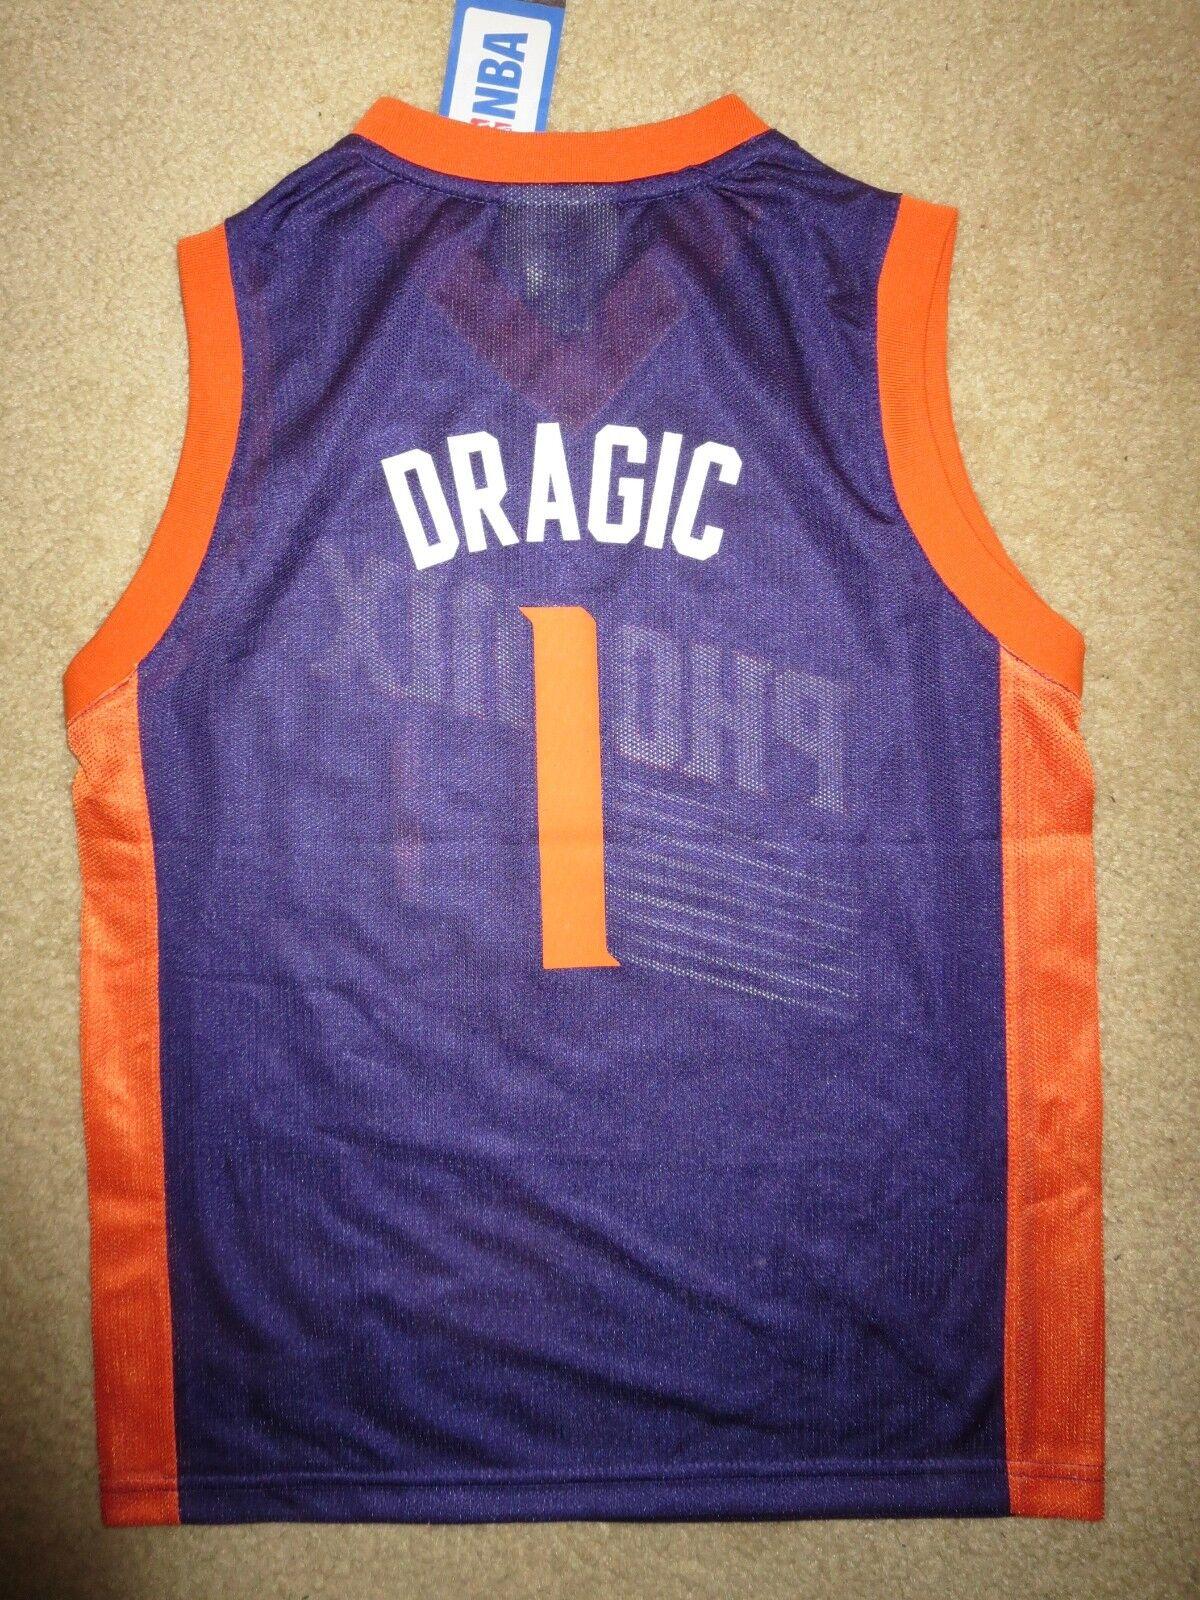 Goran Dragic  1 Phoenix Suns NBA Slowenien Slowenien Slowenien Trikot Jugendliche GRÖSSE L 14-16 9f0e09